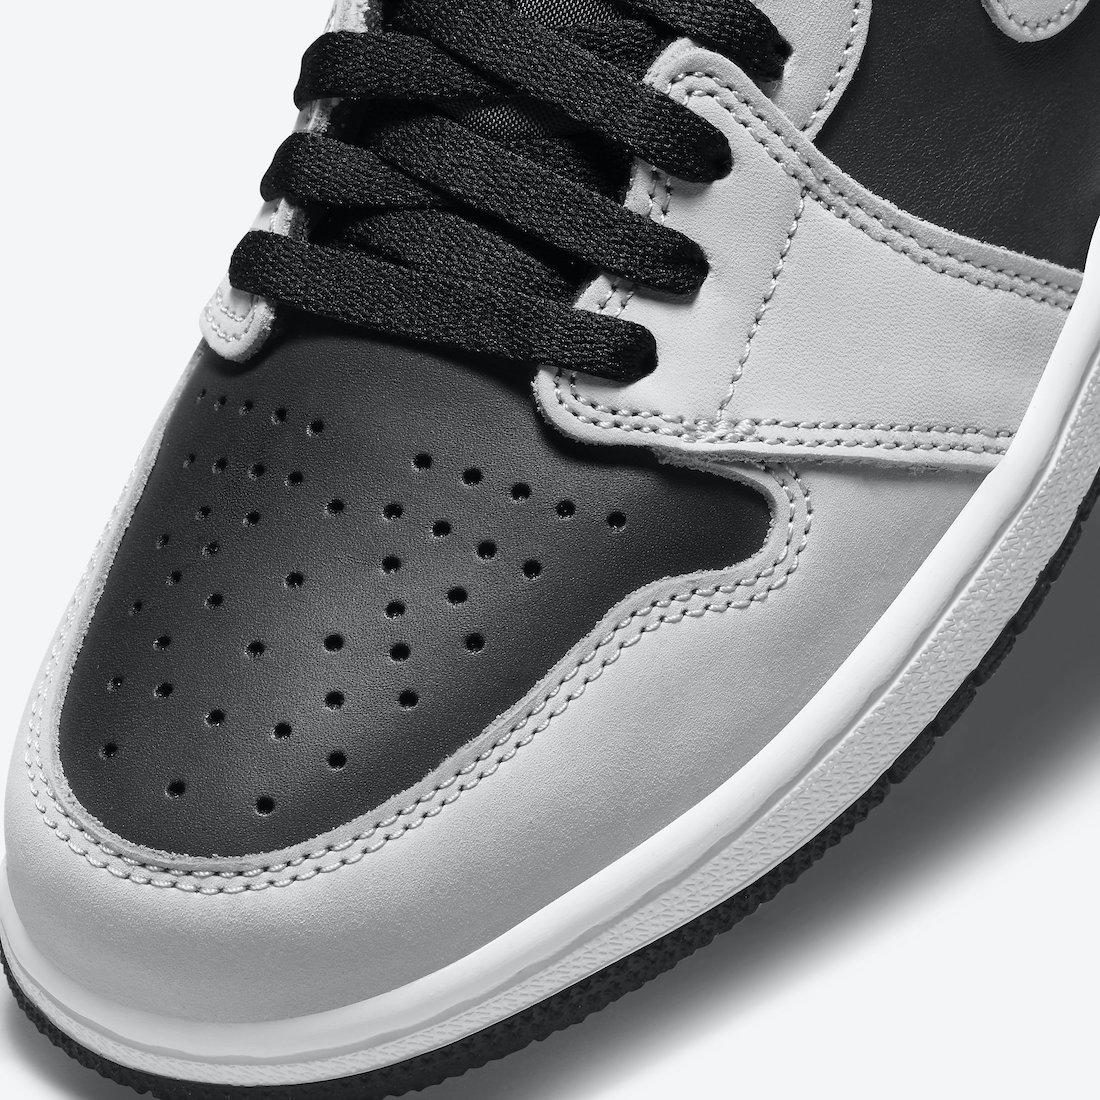 Air-Jordan-1-Shadow-Light-Smoke-Grey-555088-035-Release-Date-Price-6